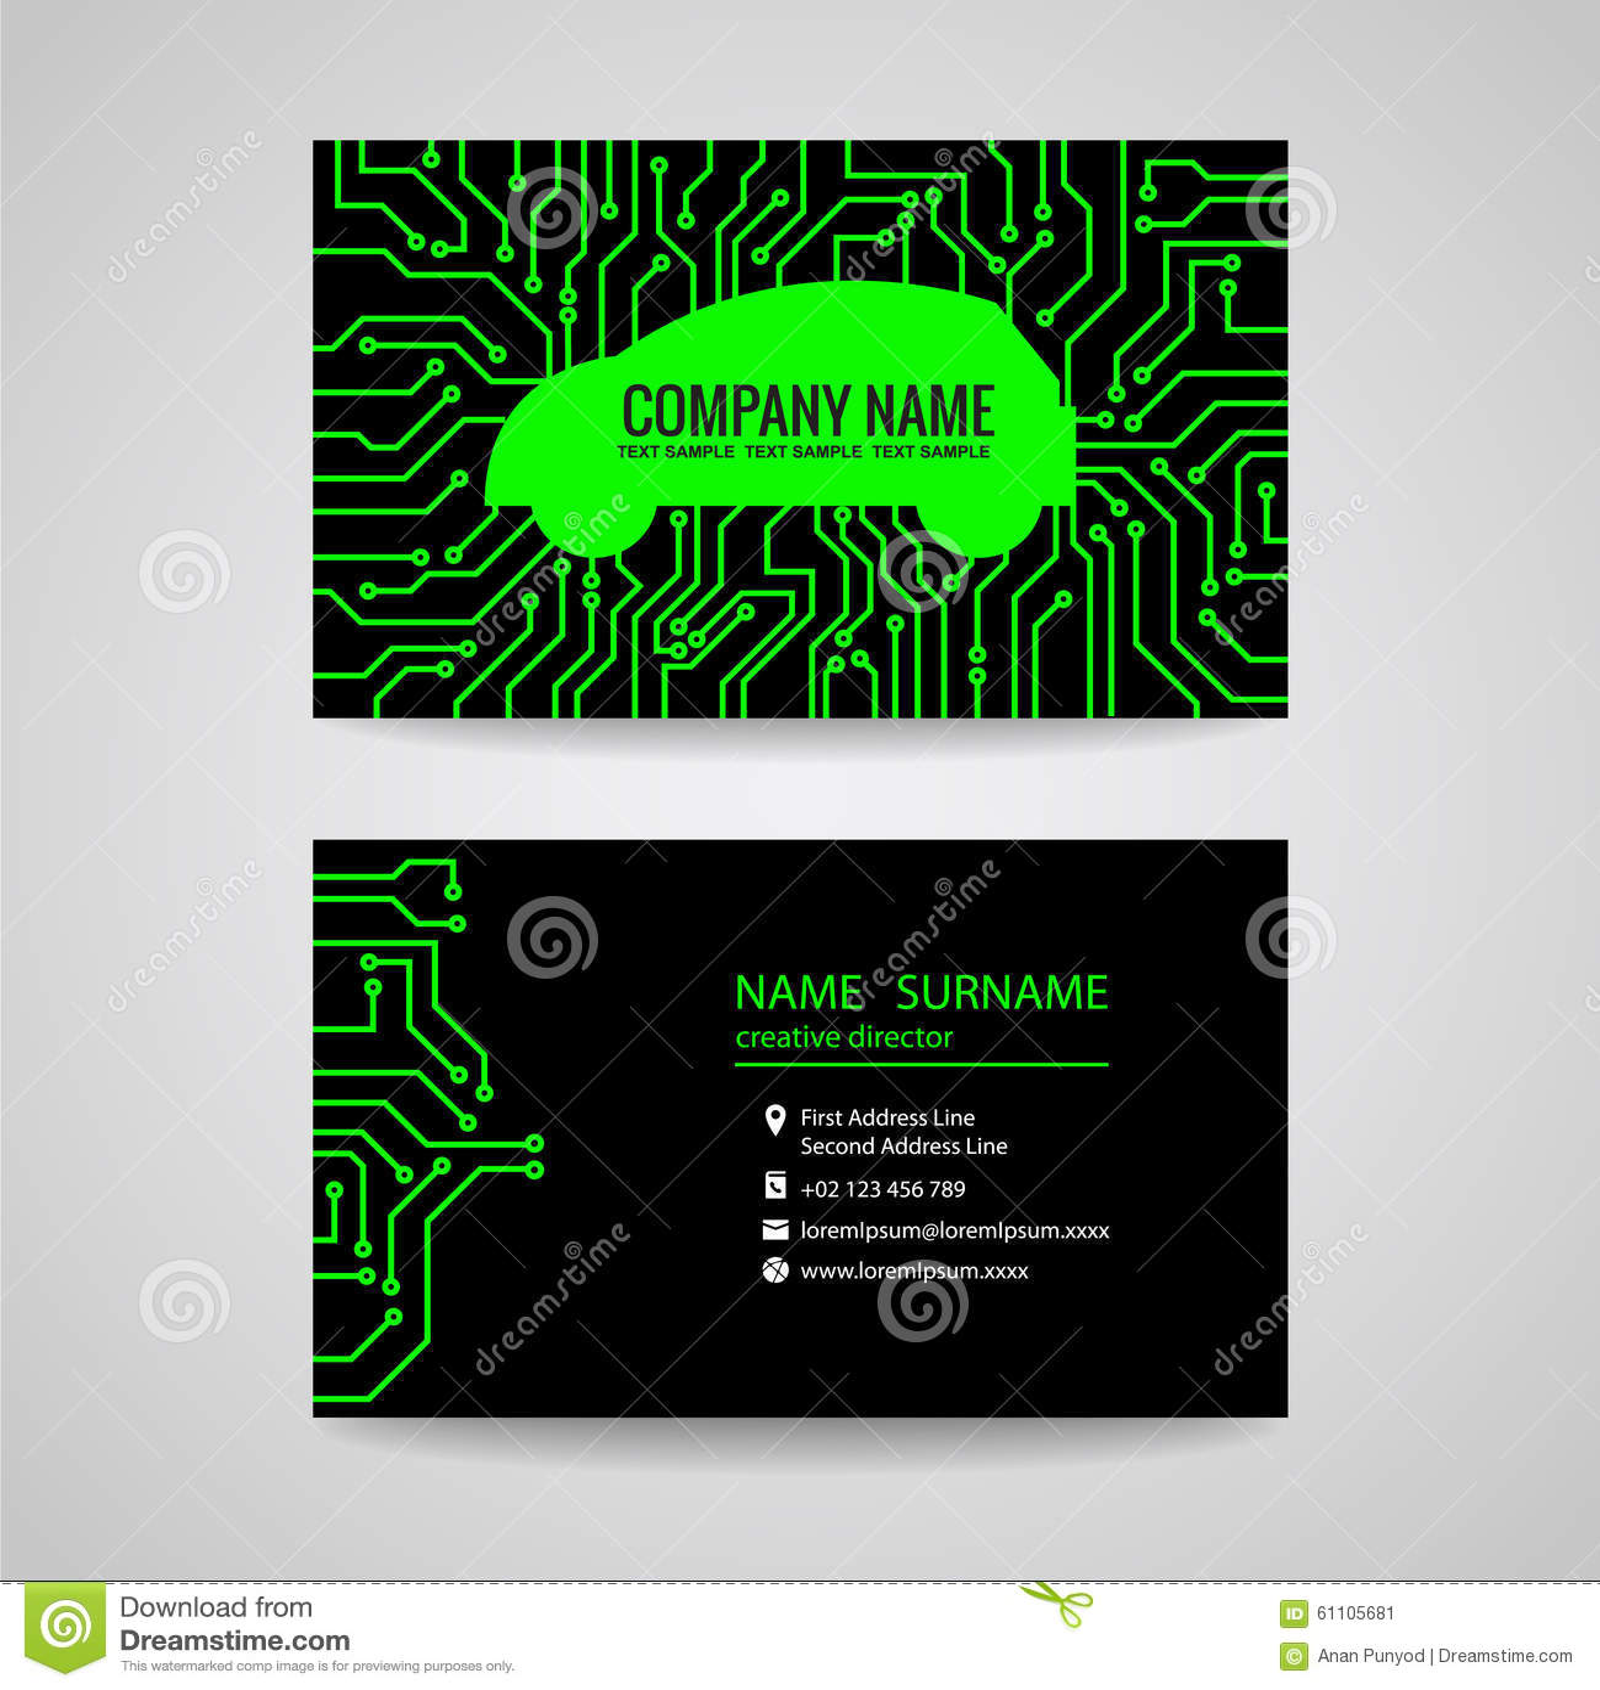 Impresso Ilustraes Vetores E Clipart De Stock 30527 Printed Circuit Board Images Image 7251734 Placa Circuito Carto Carro Verde Eletrnica No Fundo Preto Ilustrao